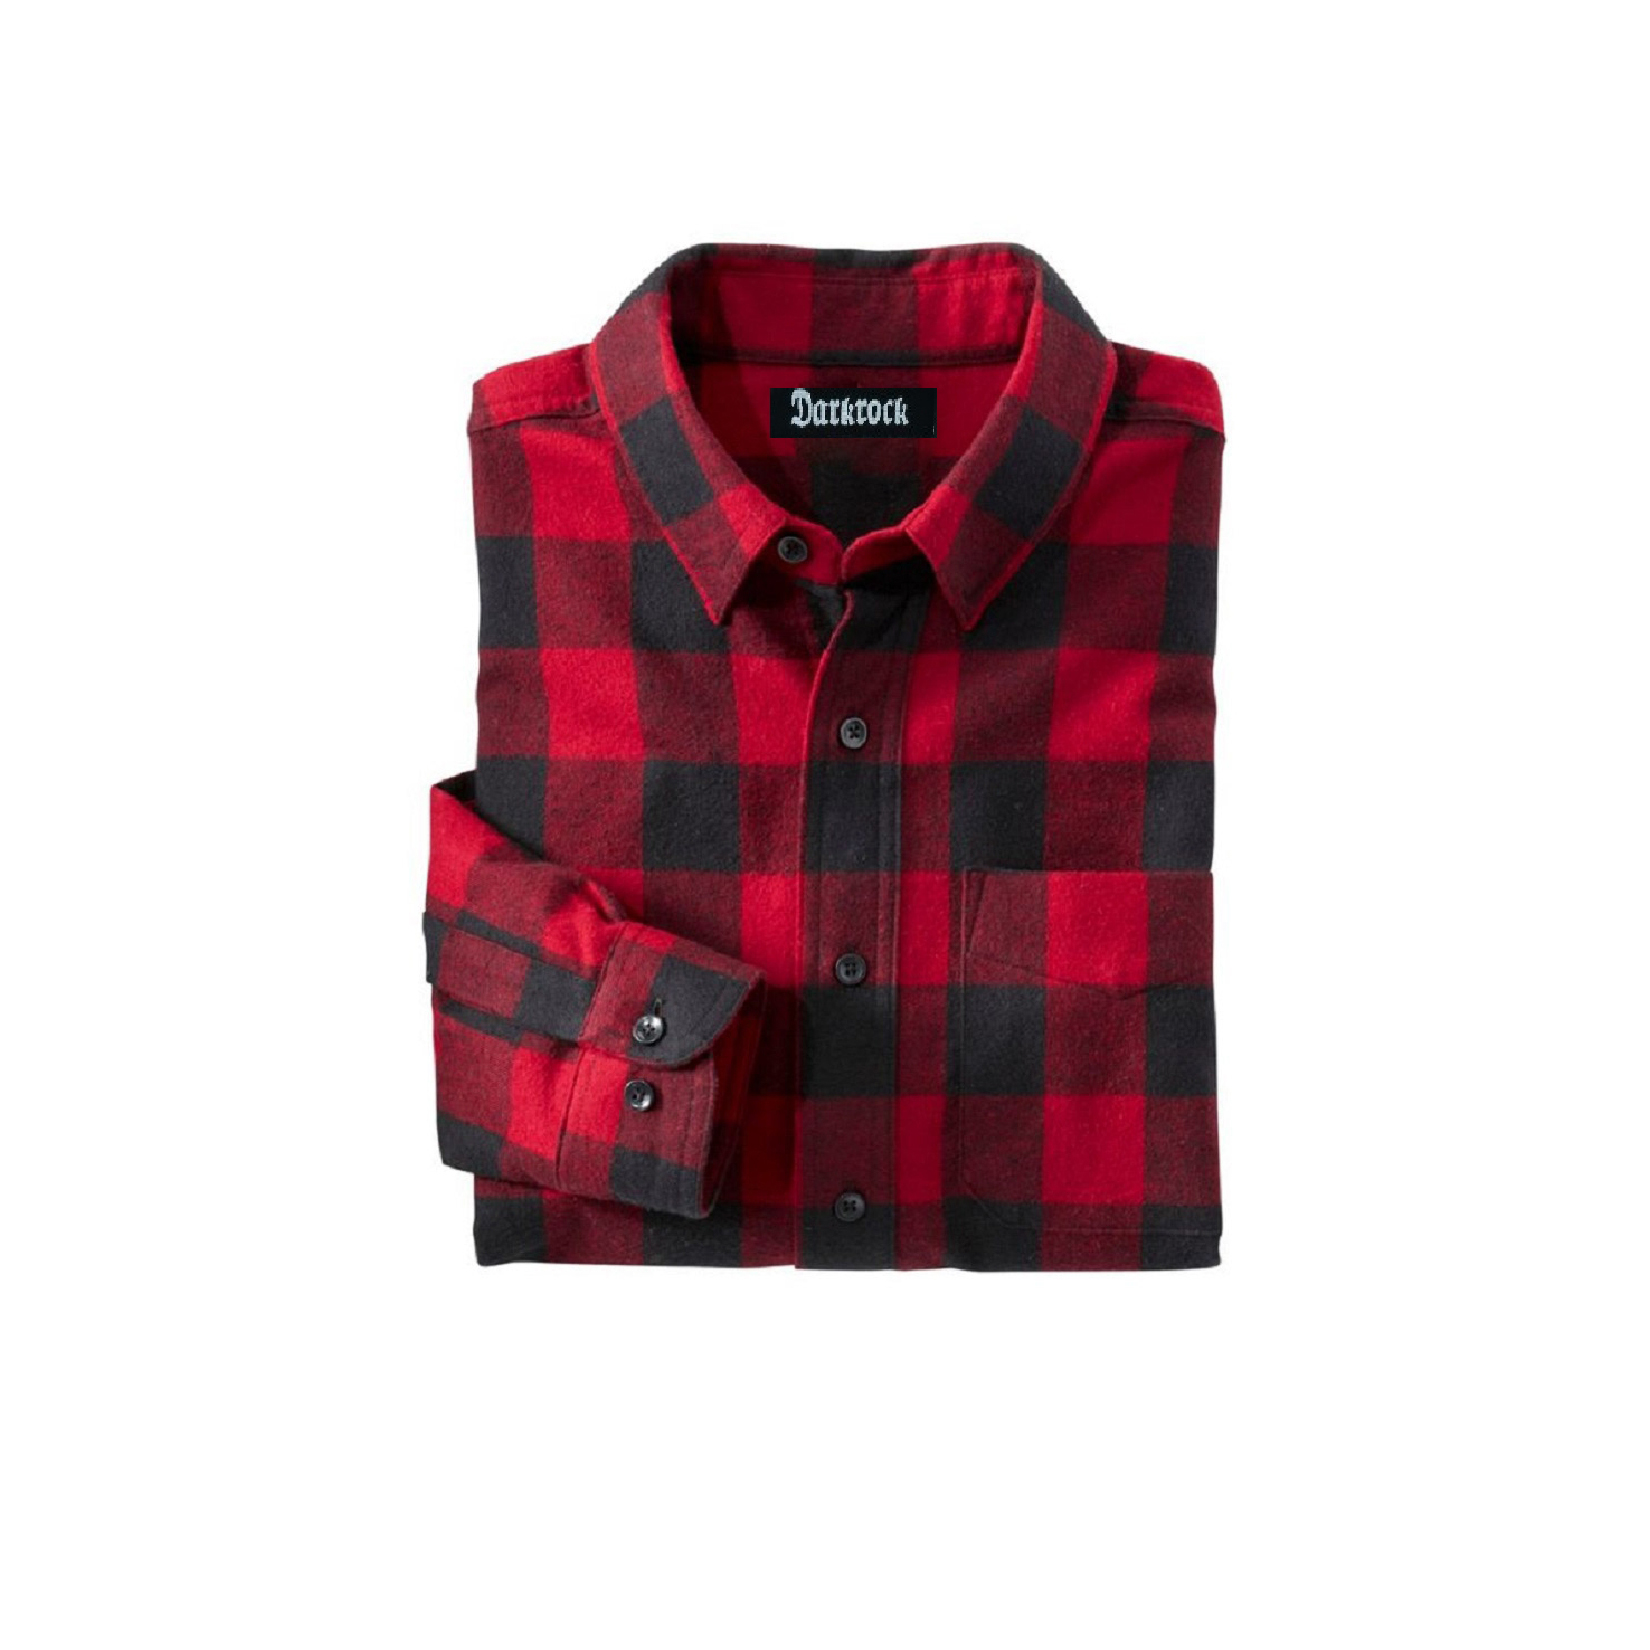 Red Flannel Buffalo Plaid Cotton Button Down Unisex Shirt